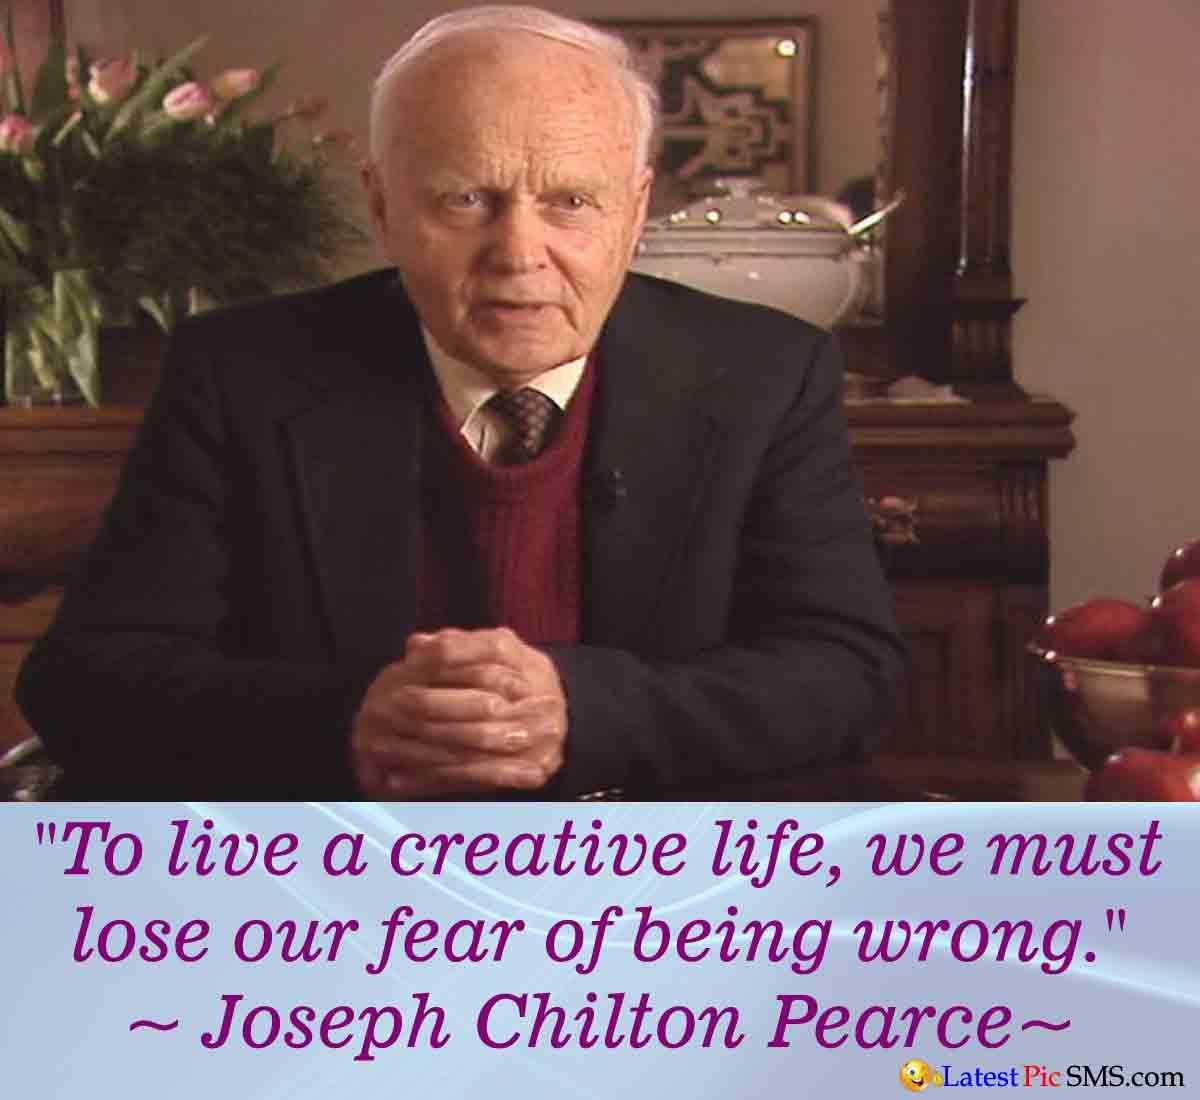 Joseph Chilton Pearce life quote